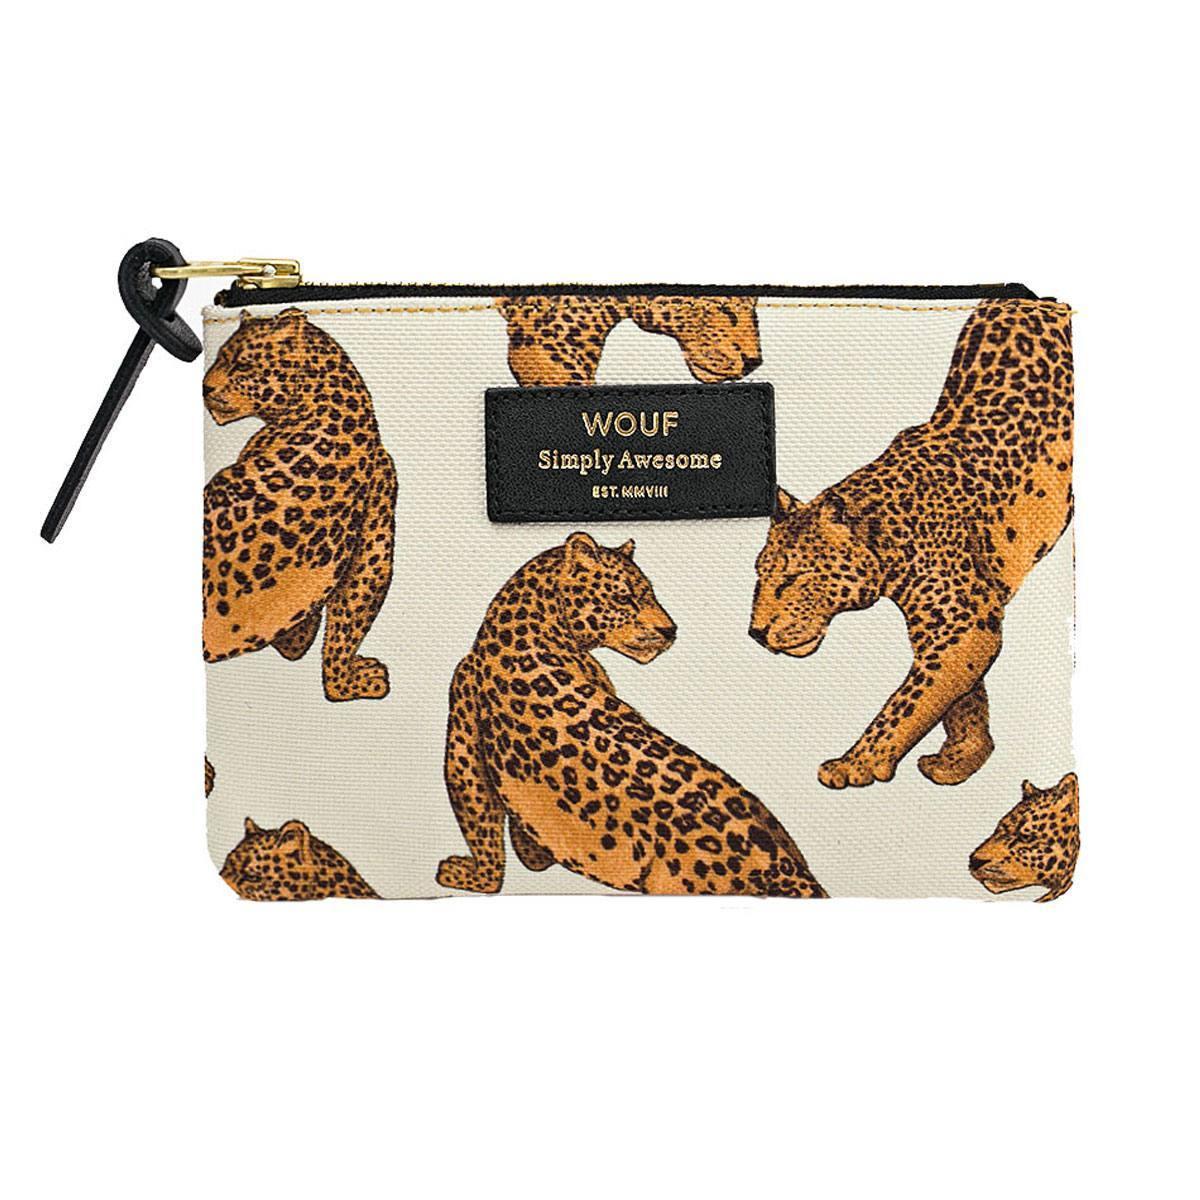 Trendy Portemonnee.Wouf Leopard Portemonnee Handig In Gebruik En Super Trendy